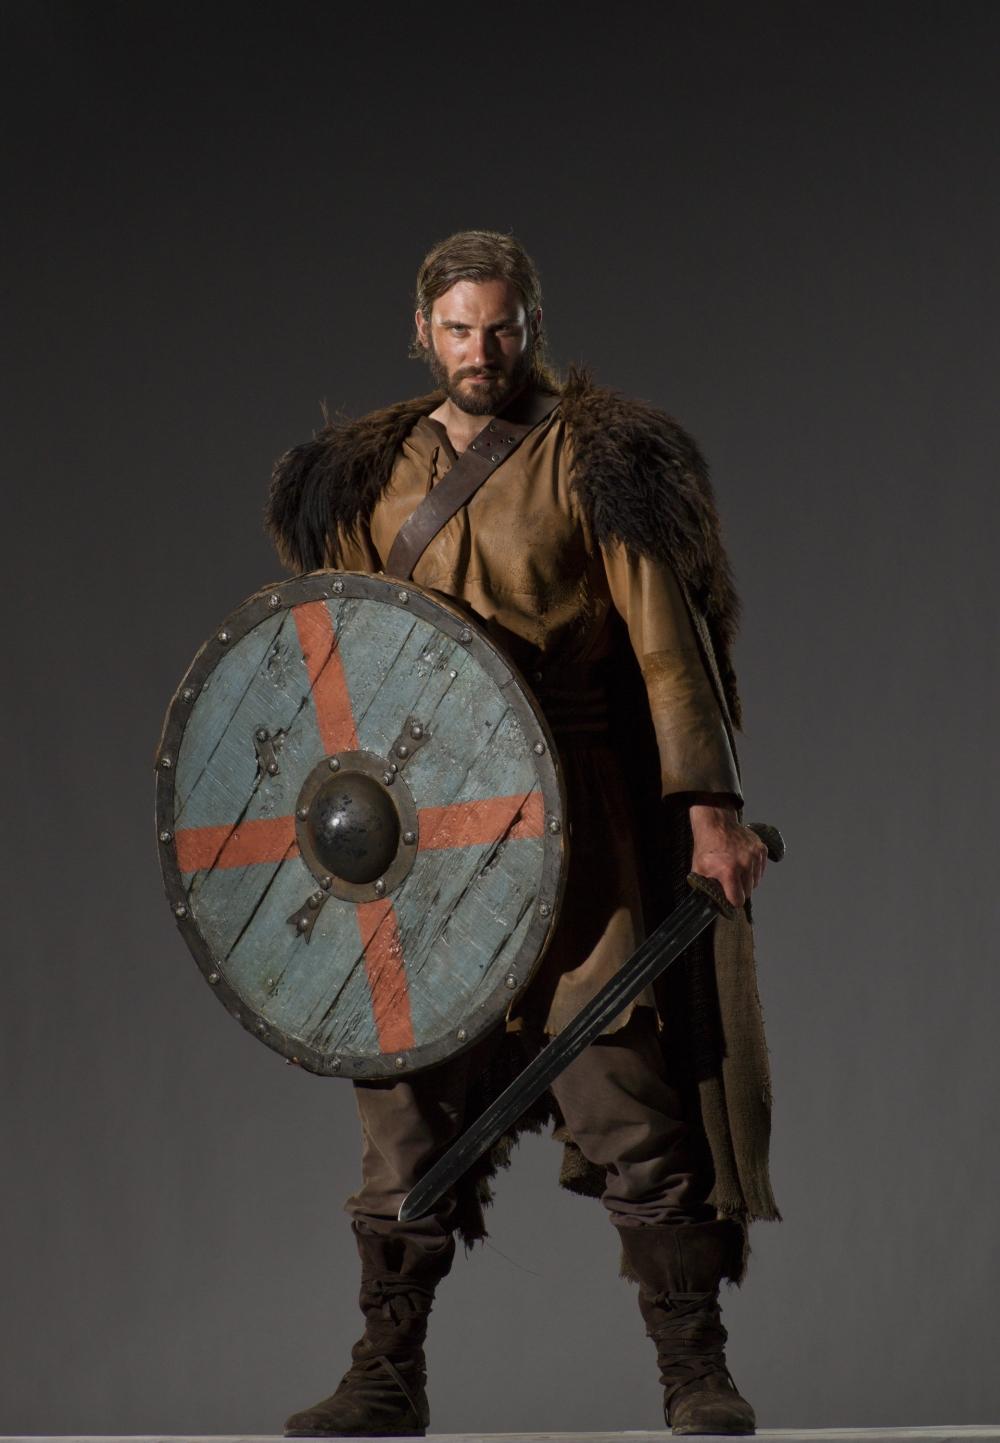 Rollo .................... Vikings-Promo-Rollo-vikings-tv-series-33876620-1000-1443